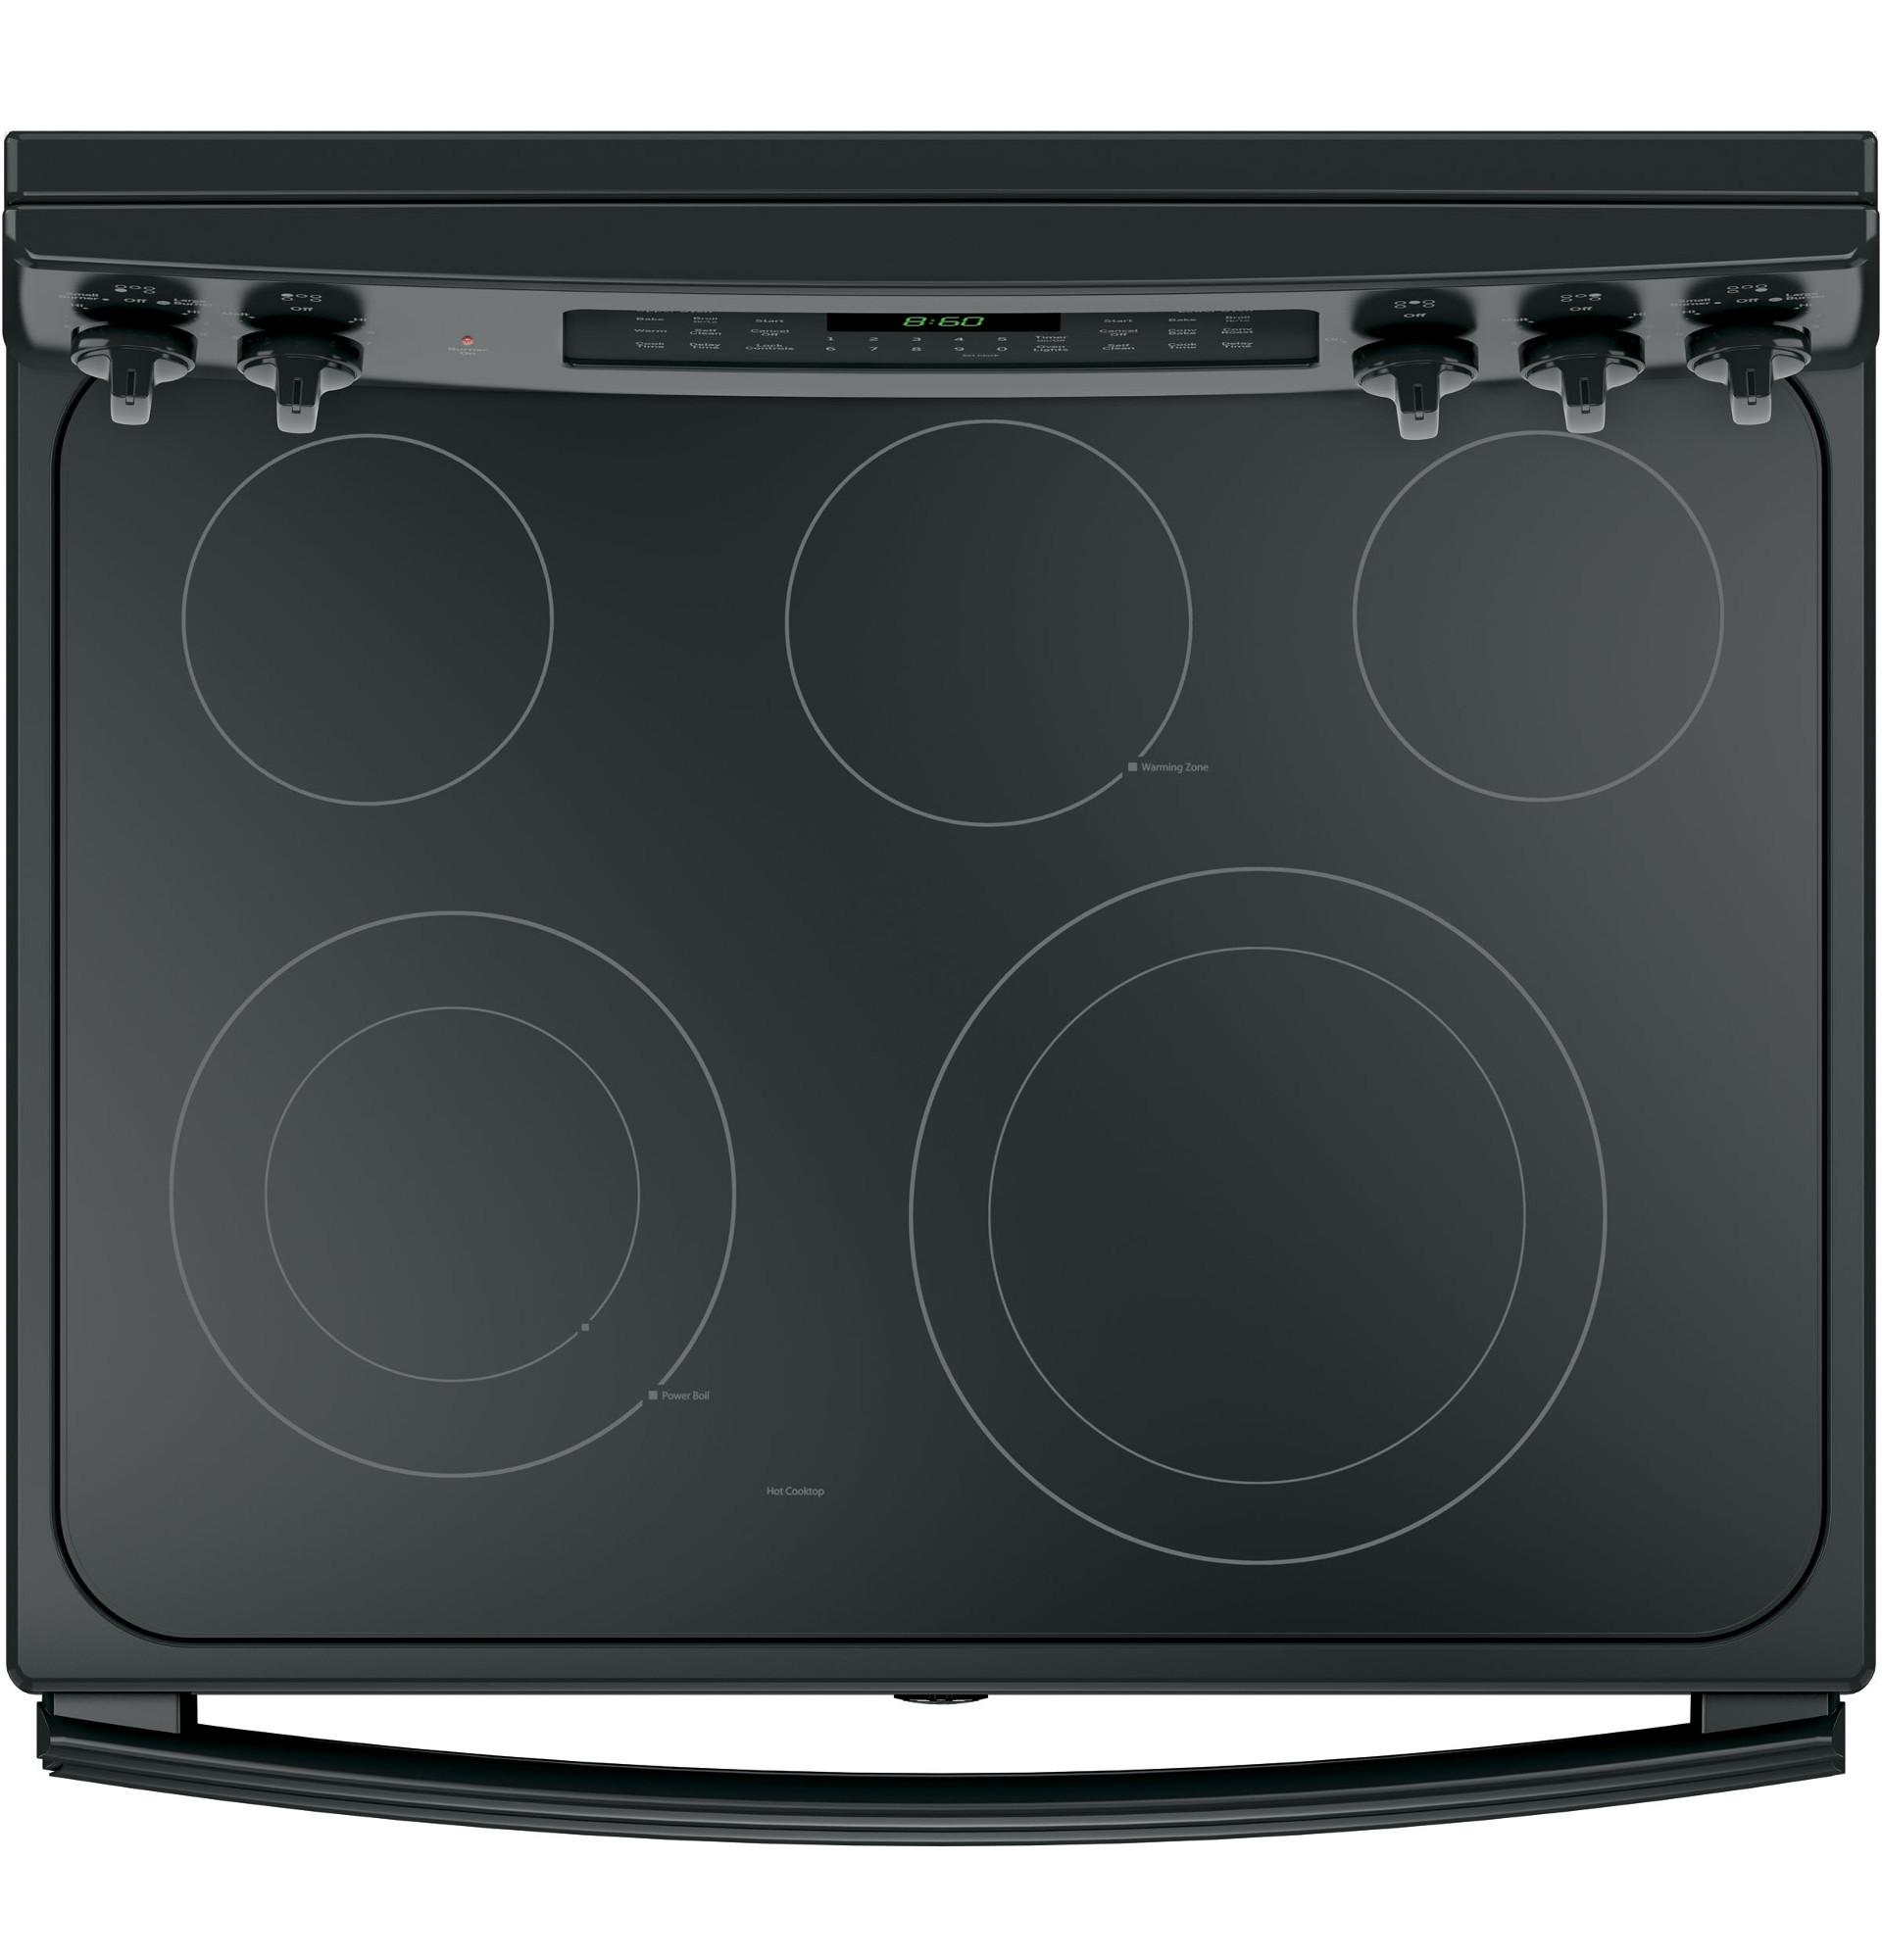 GE Appliances JB860DJBB 6.6 cu. ft. Freestanding Electric Double Oven Convection Range - Black